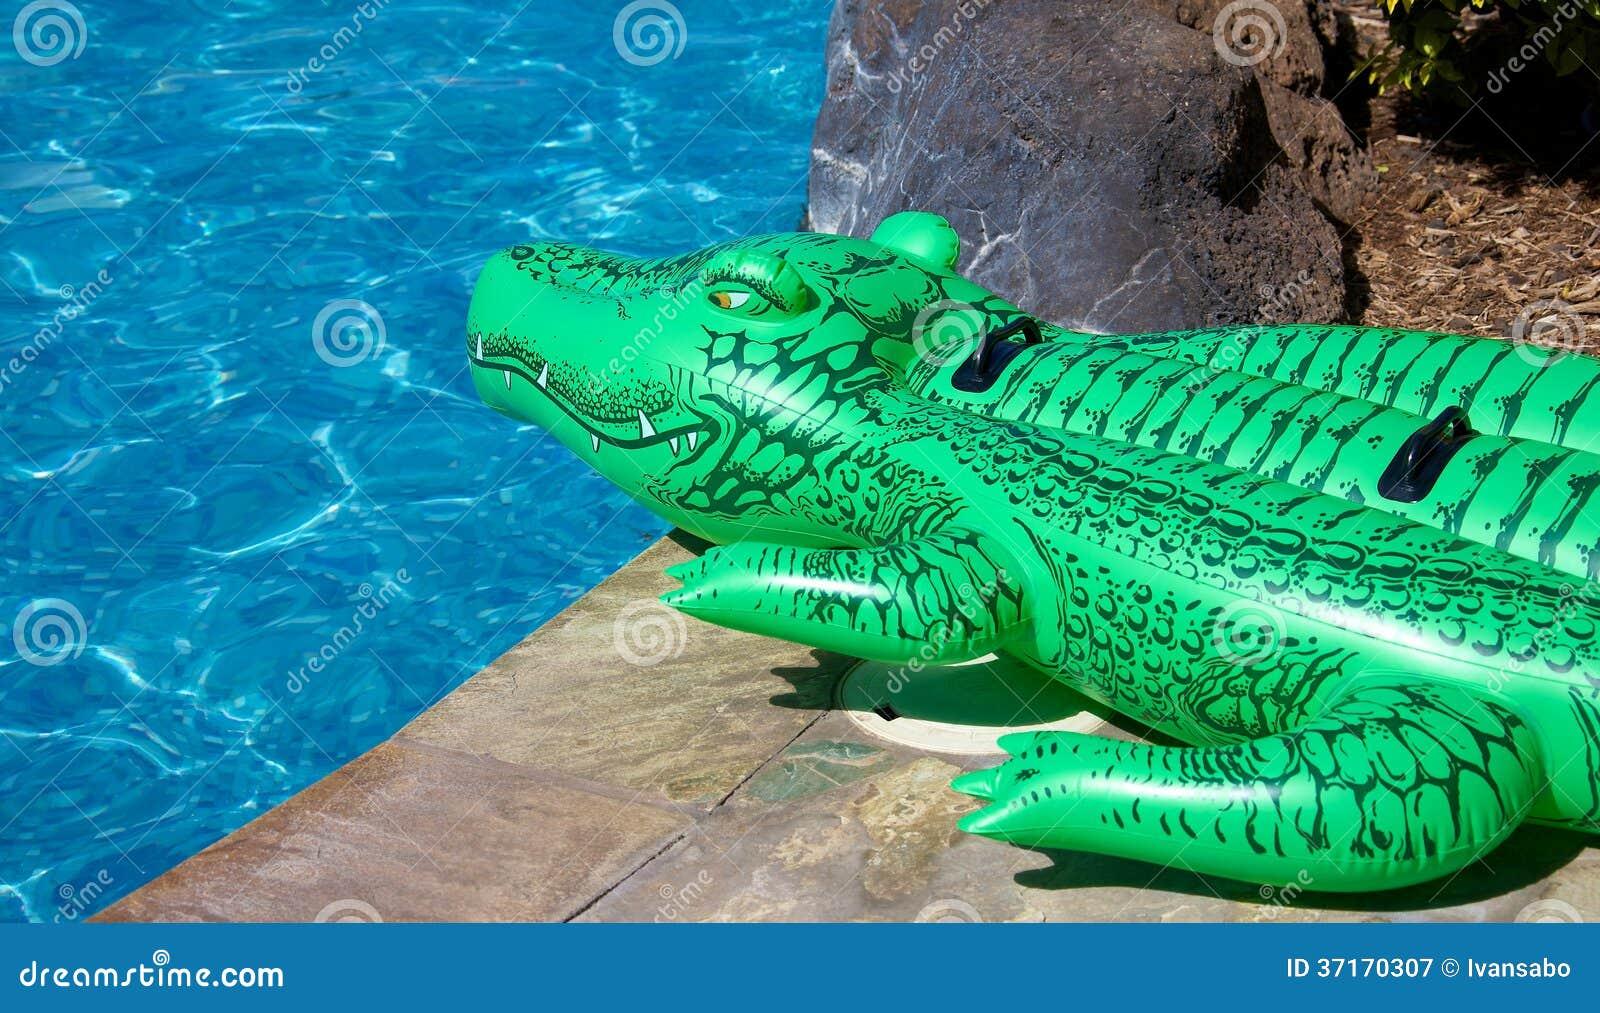 Crocodile gonflable photographie stock libre de droits for Animaux gonflable piscine